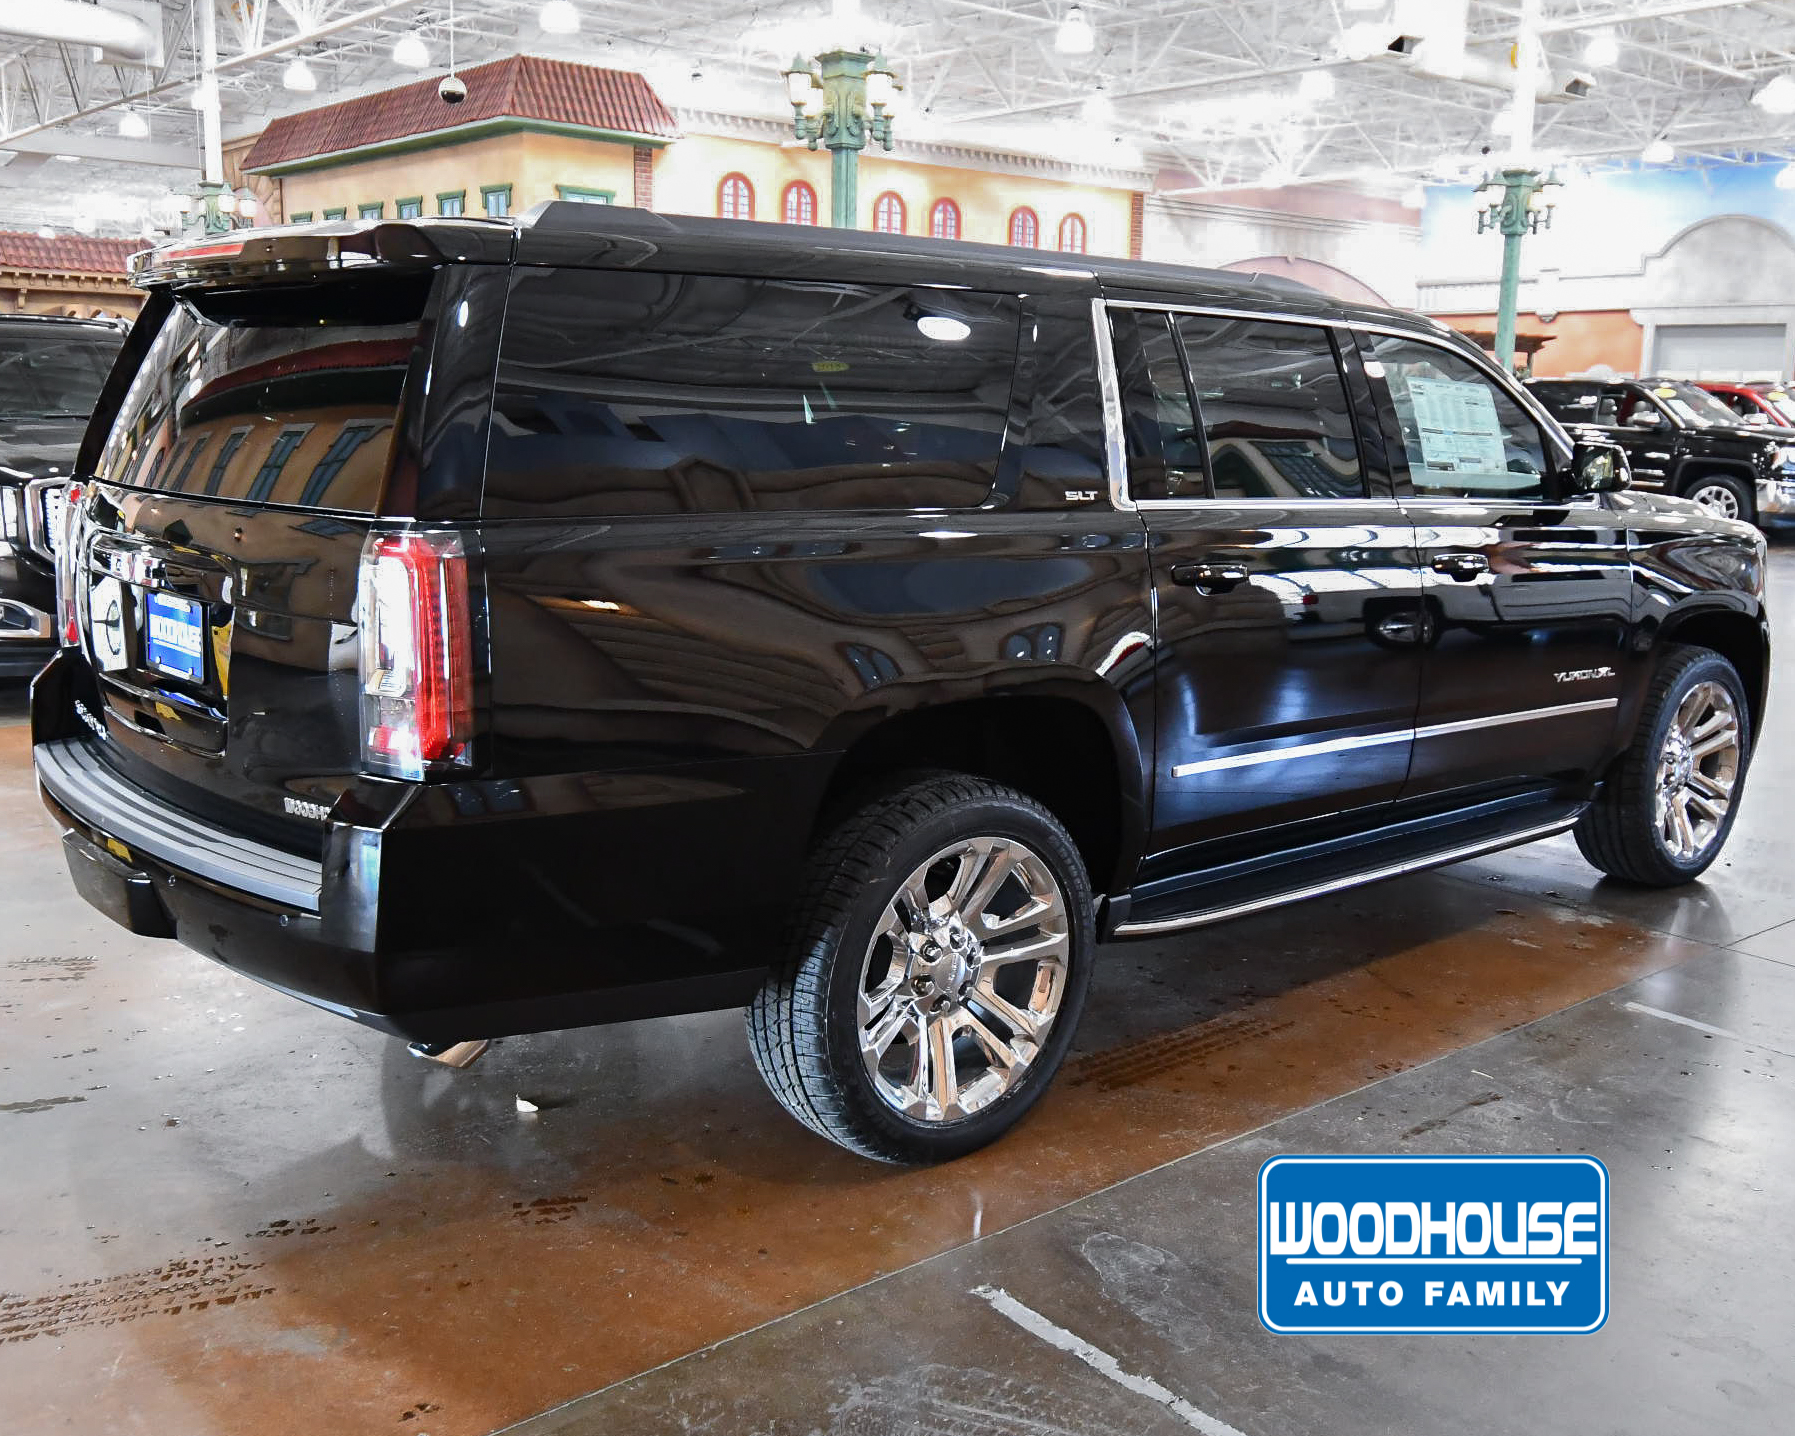 Abp 656 woodhouse | new 2020 gmc yukon xl for sale | buick gmc (omaha)